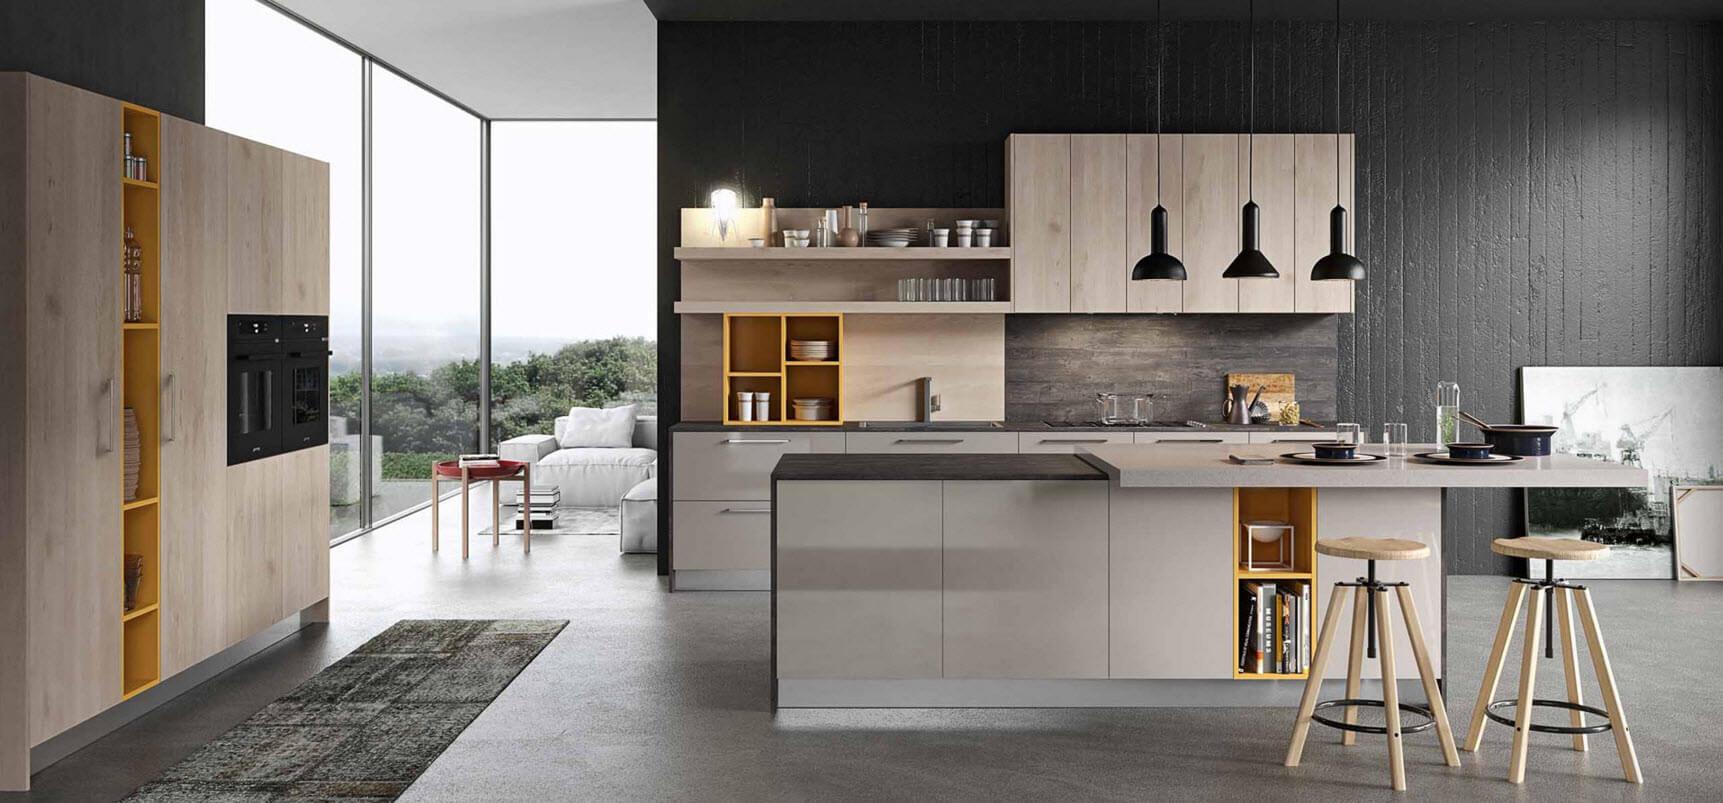 Modern kitchen with gray concrete textures